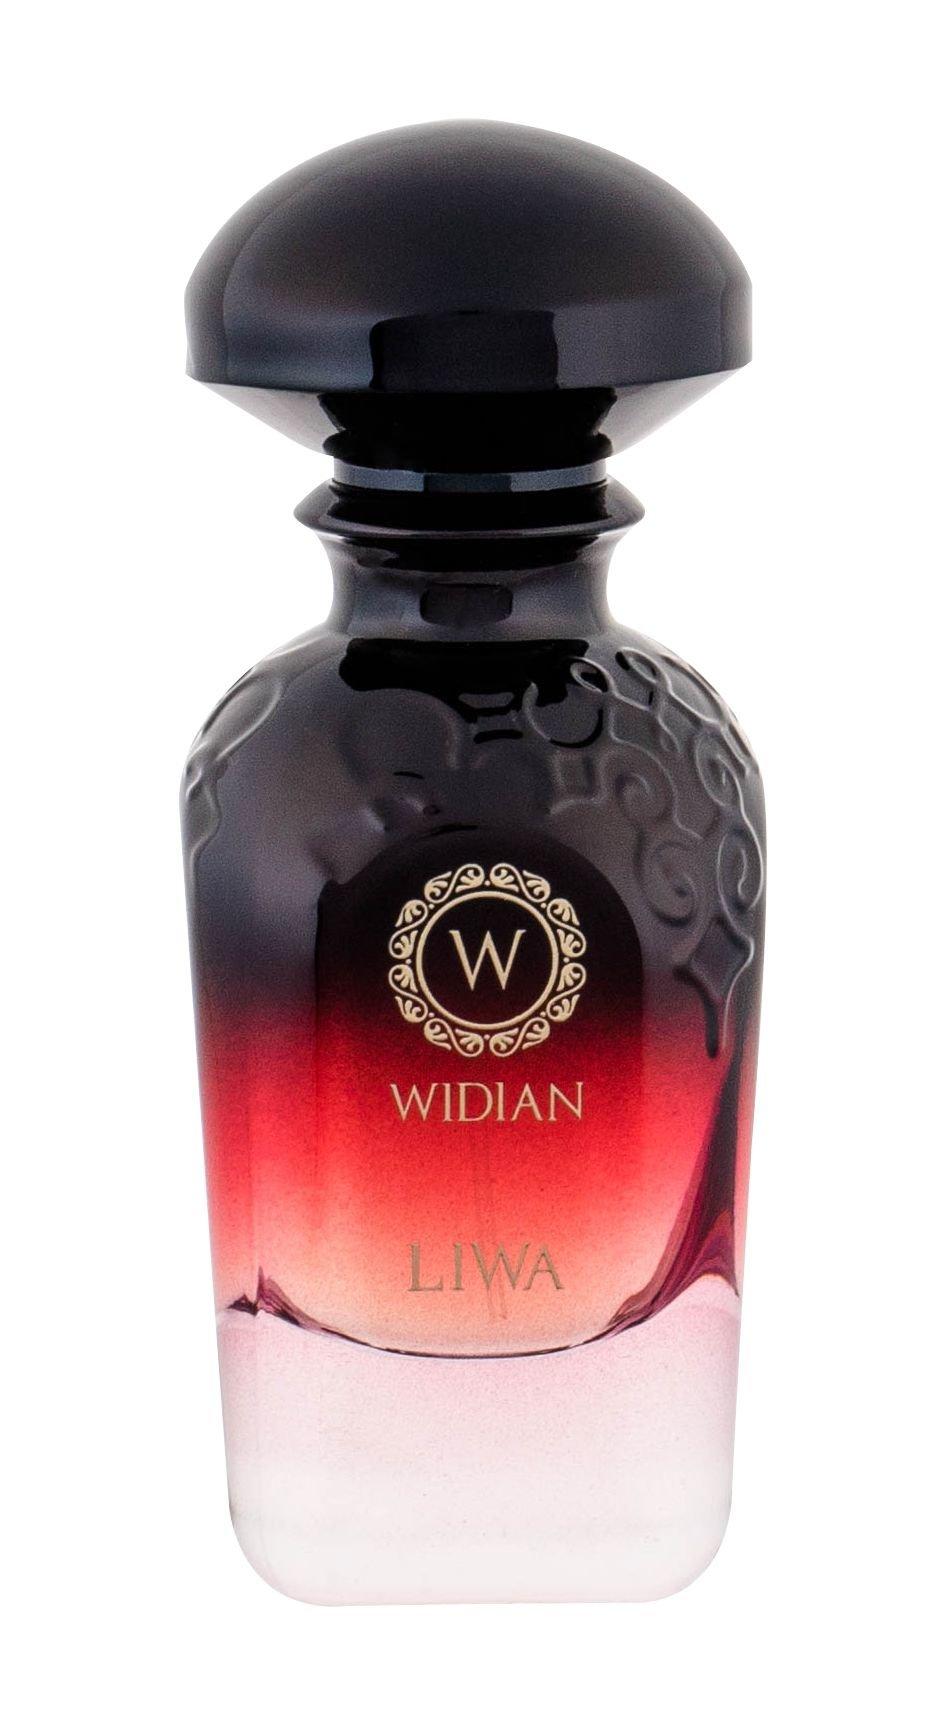 Widian Aj Arabia Velvet Collection Liwa Perfume 50ml